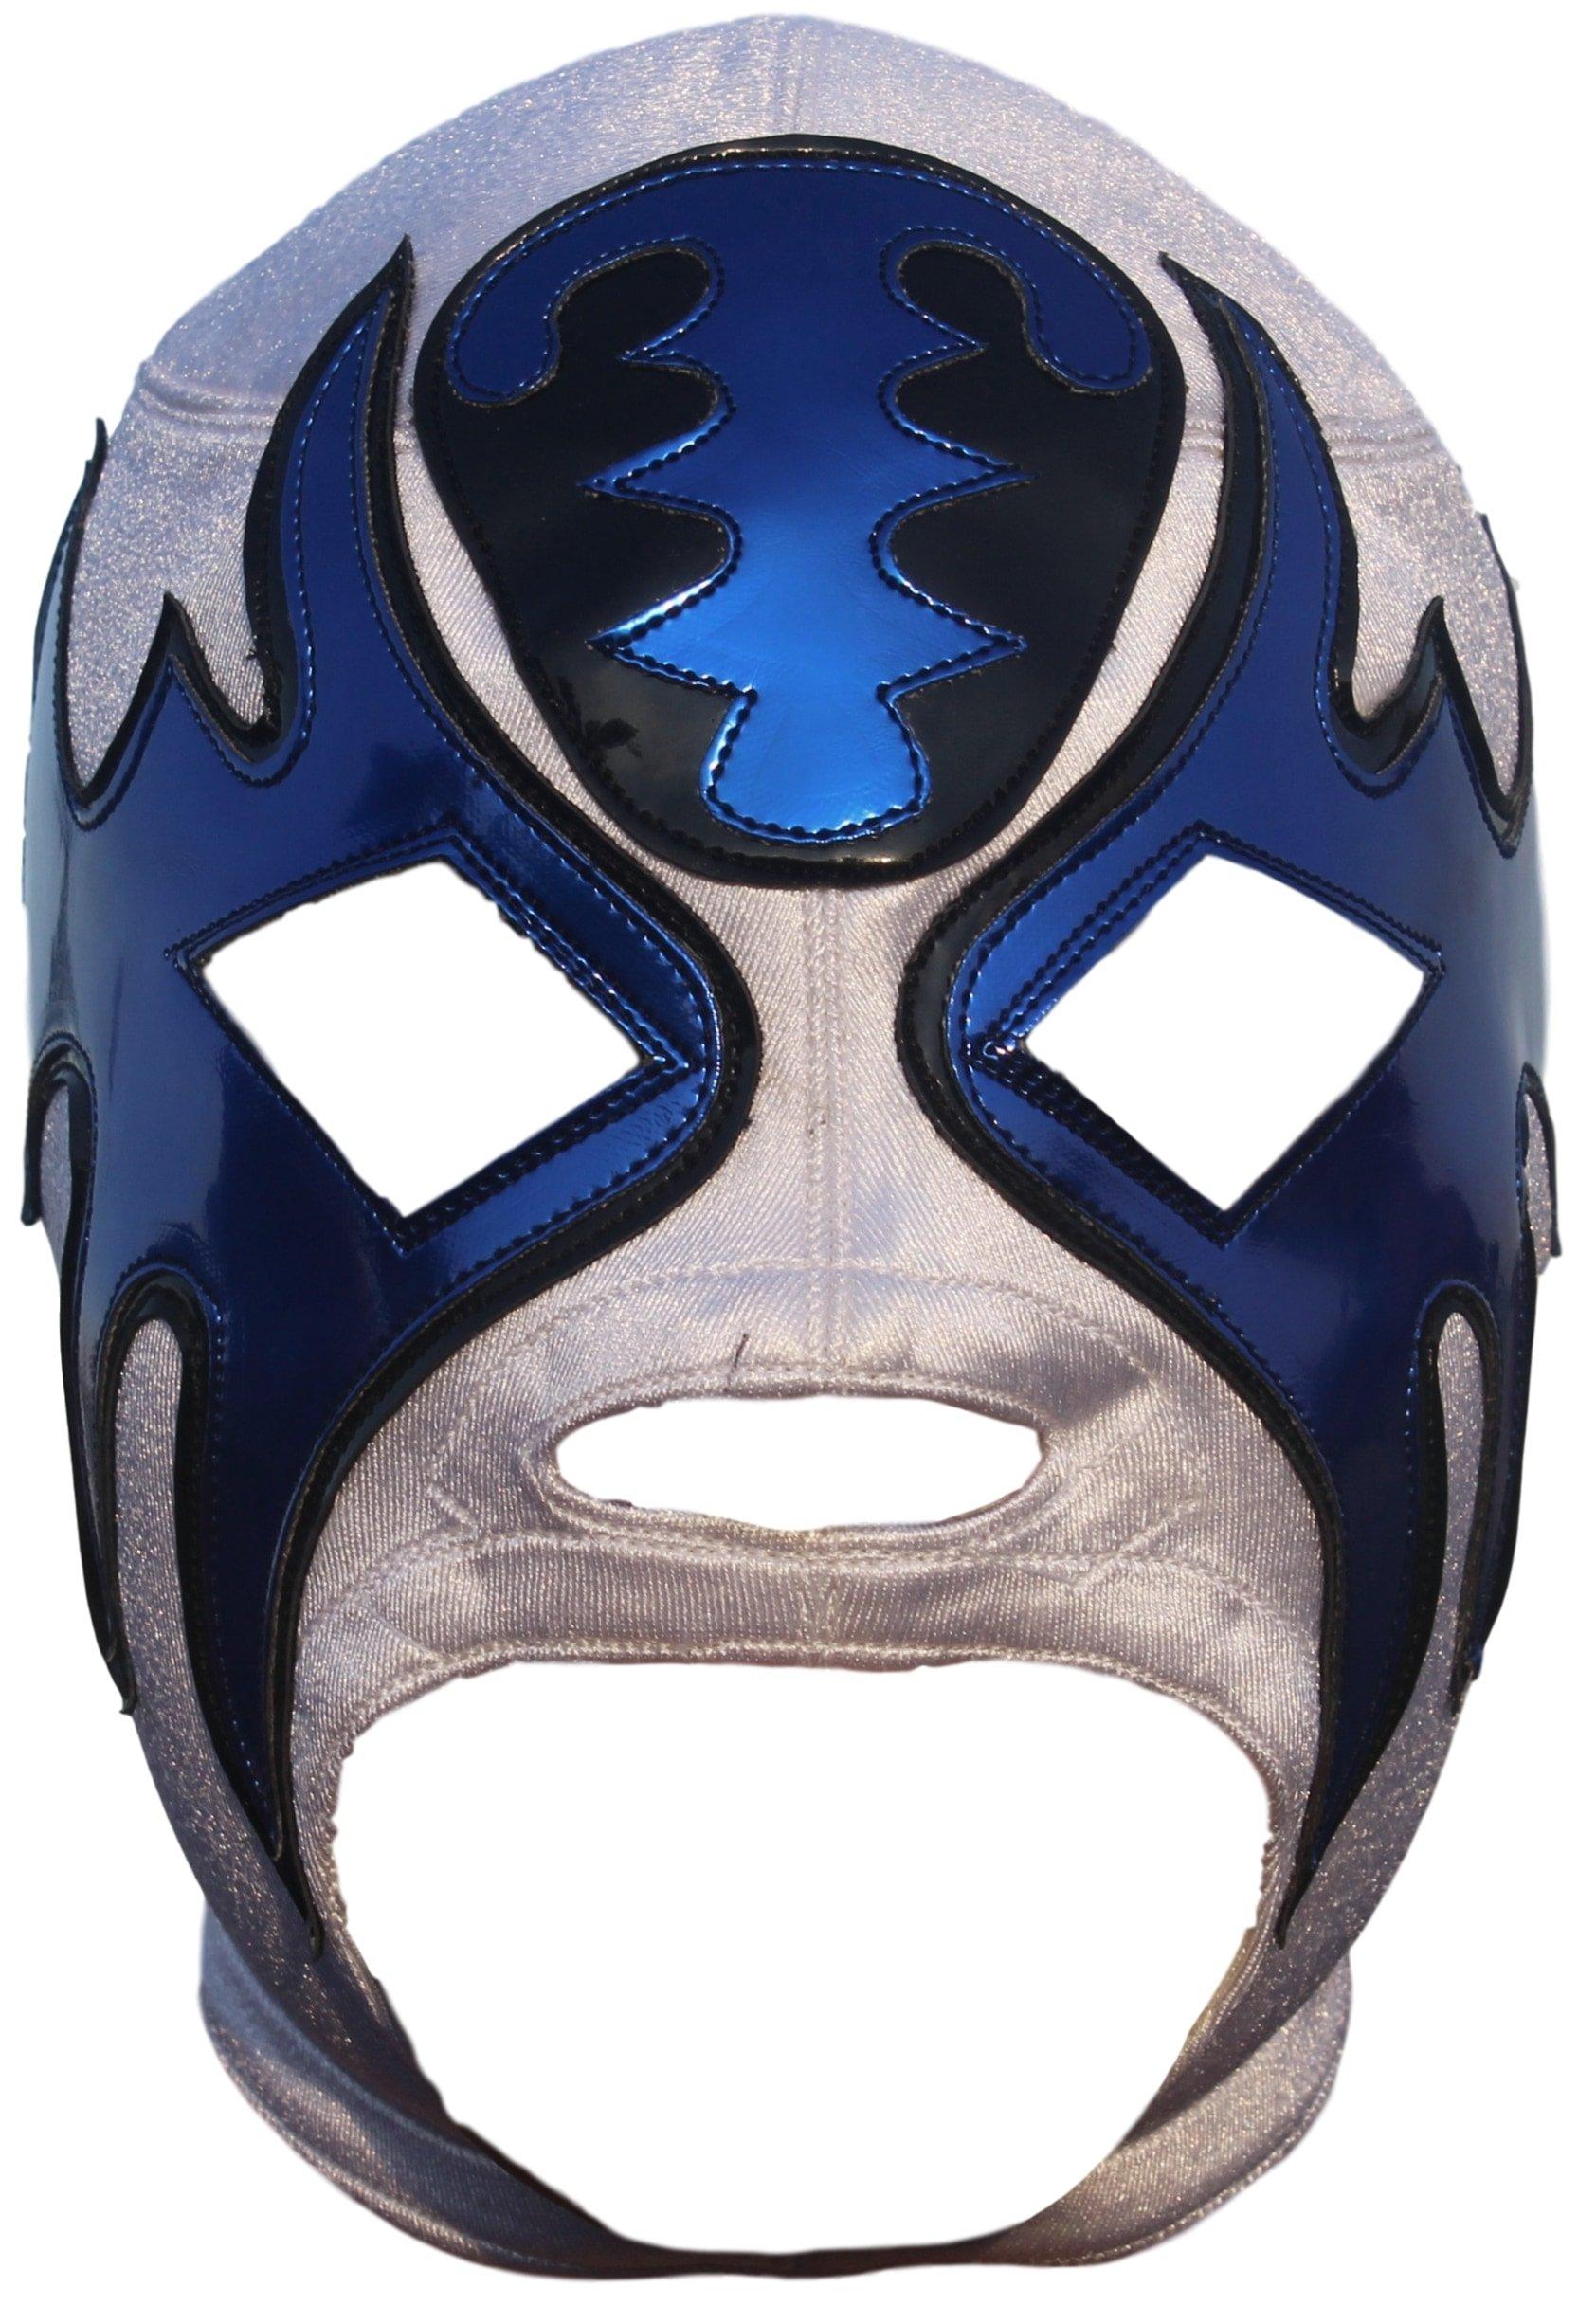 Deportes Martinez Atlantis Professional Lucha Libre Mask Adult Luchador Mask by Deportes Martinez